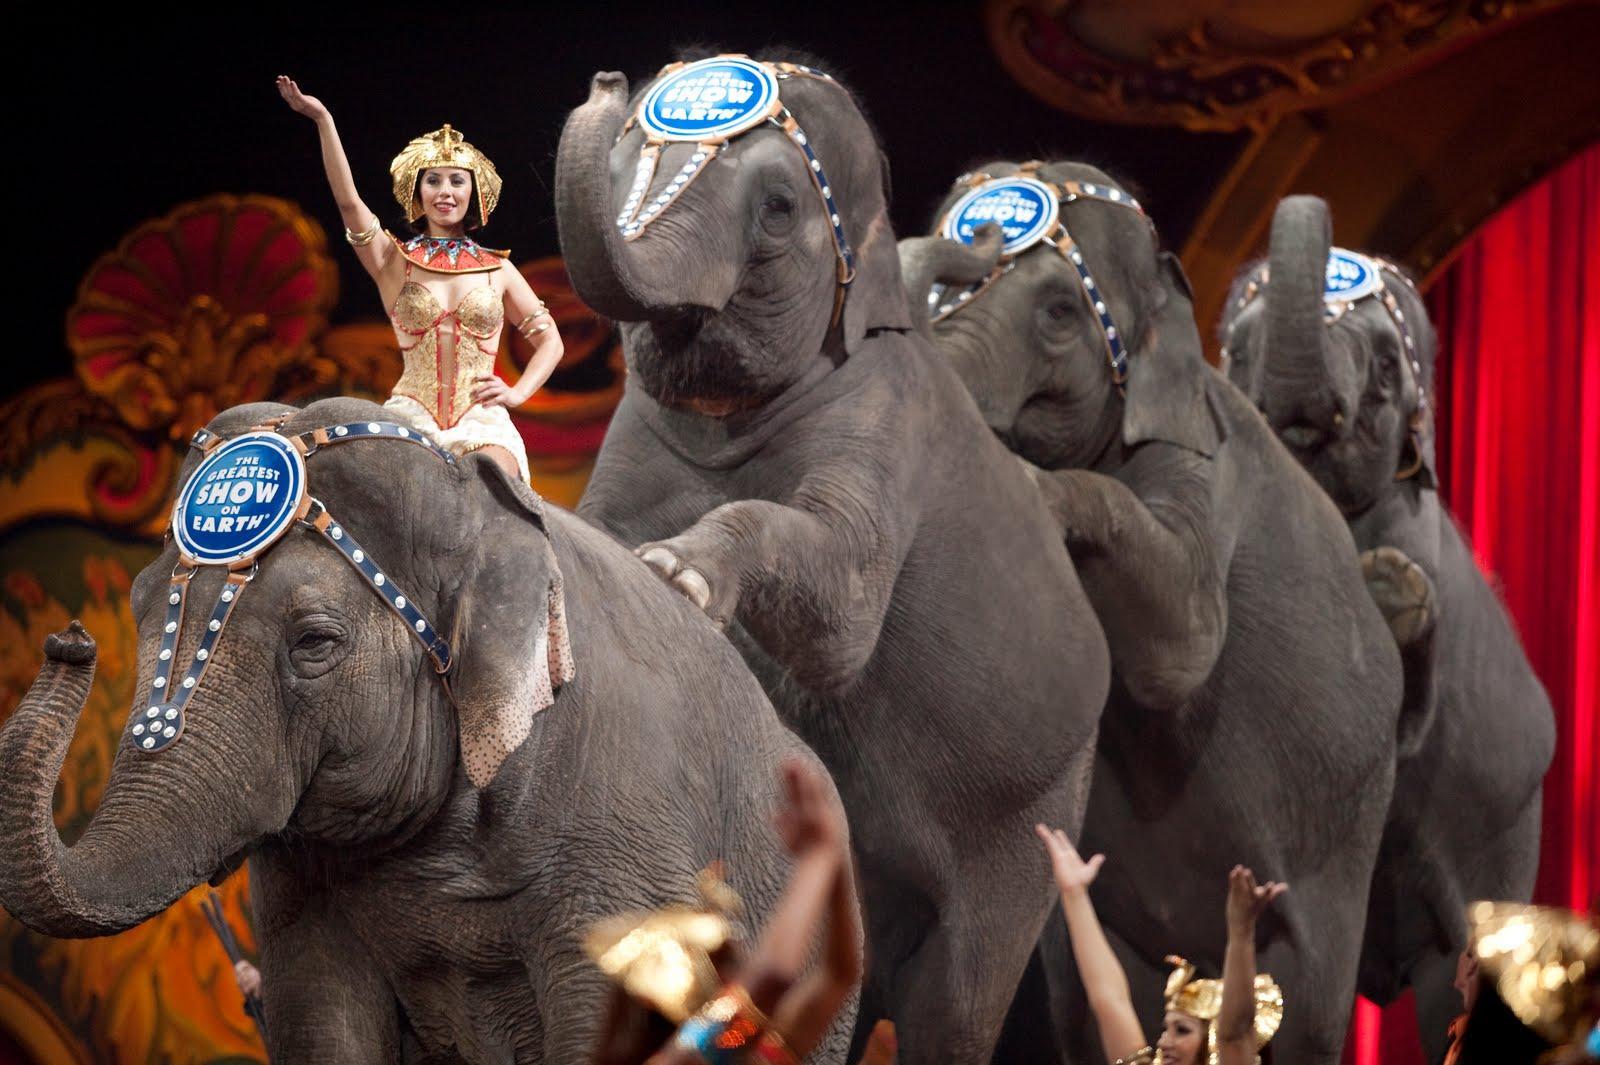 ringling-brothers-circus-elephants-3-5-15.jpeg